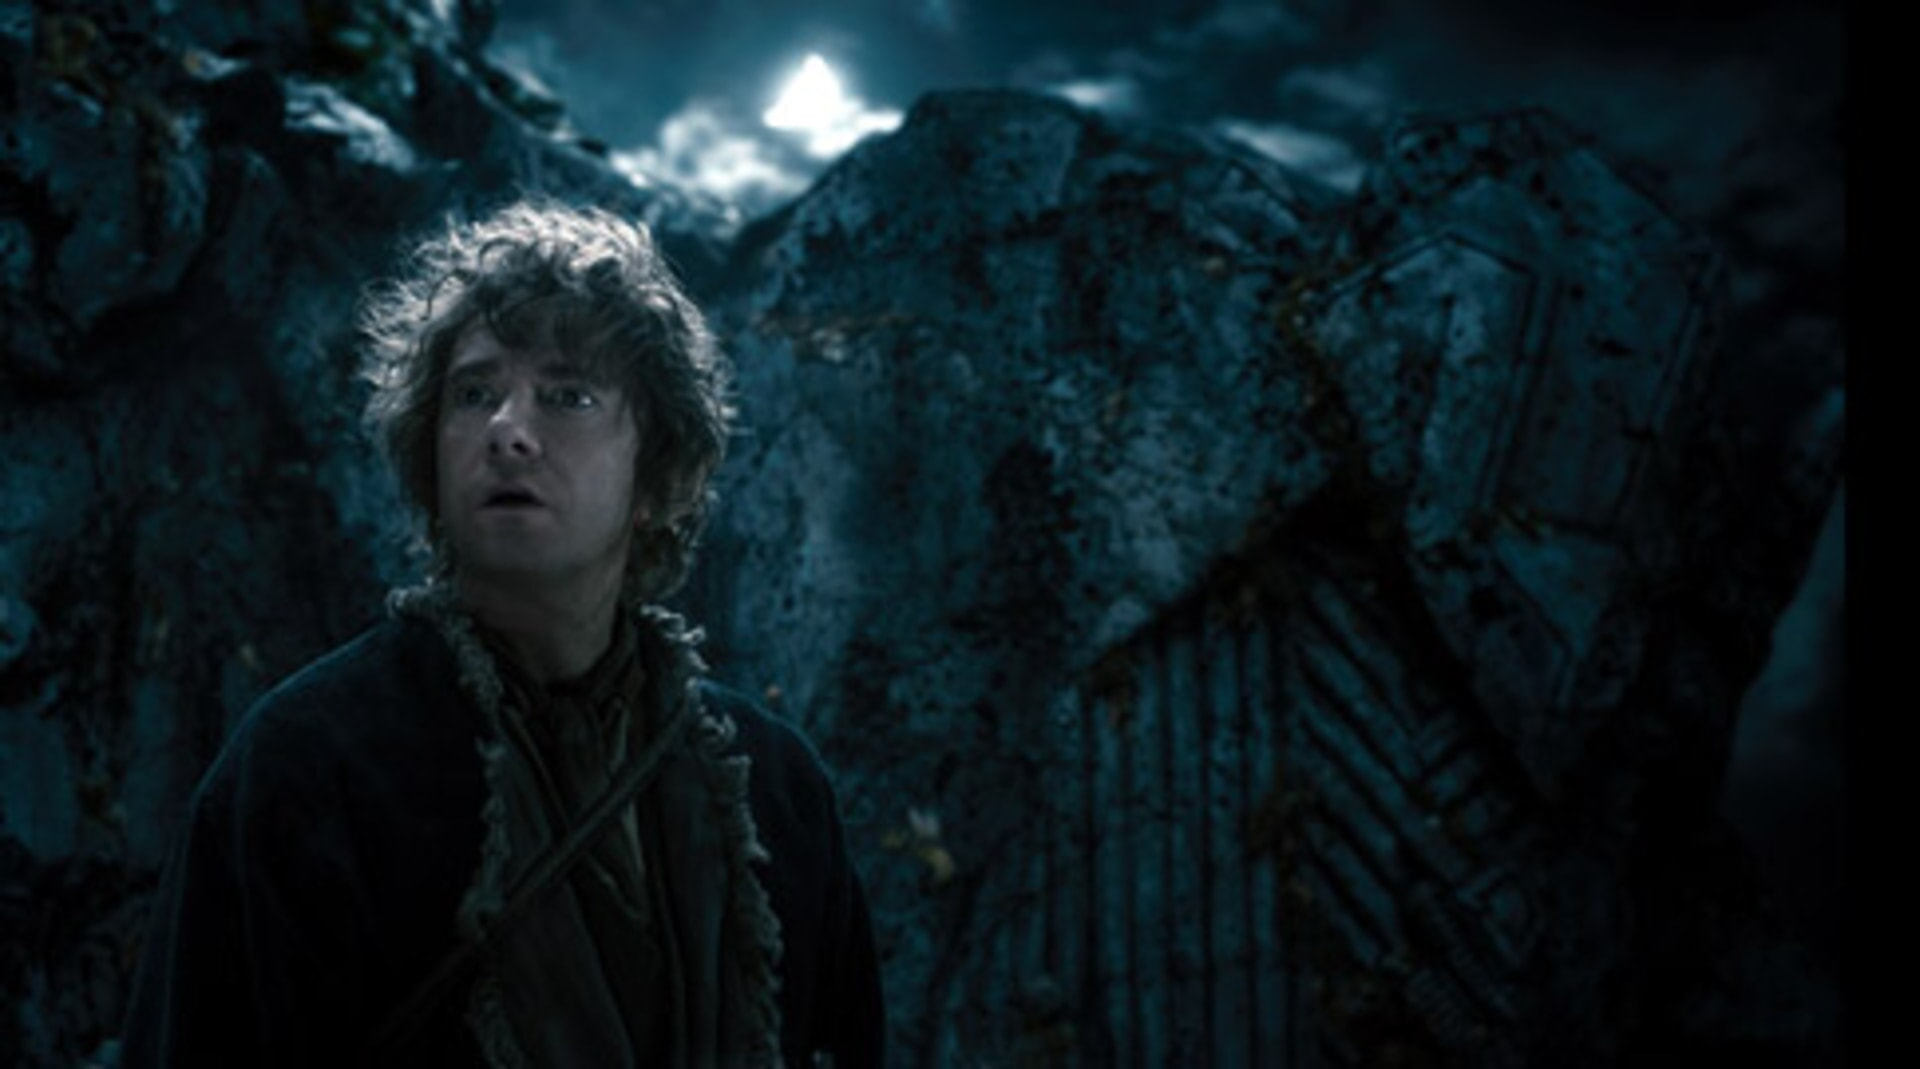 The Hobbit: The Desolation of Smaug - Image 27